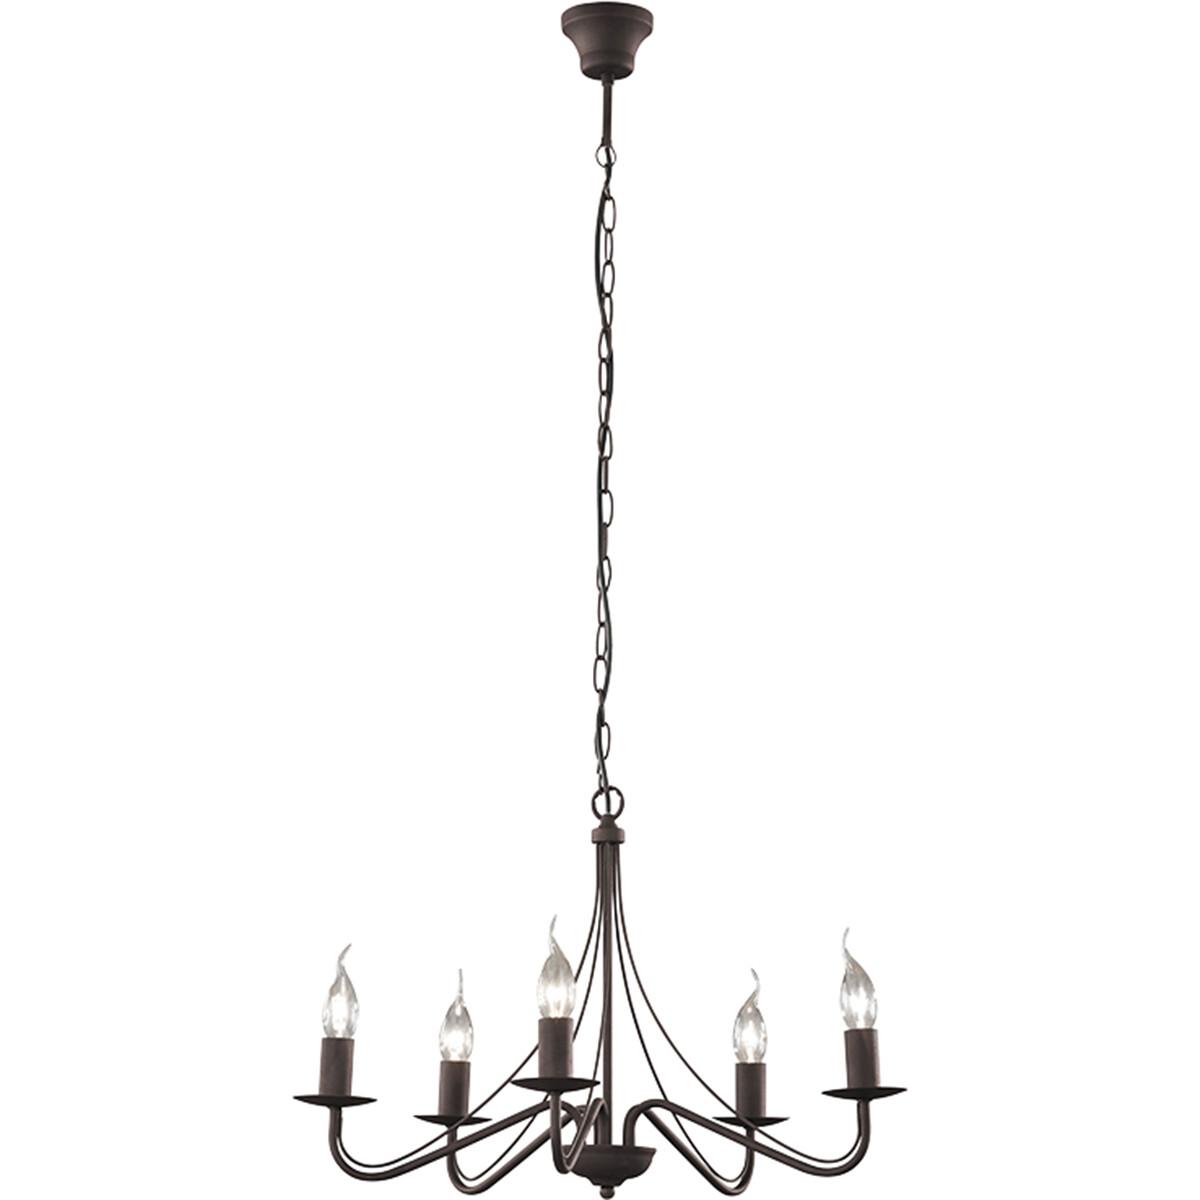 LED Kroonluchter - Trion Kantra - E14 Fitting - 5-lichts - Rond - Roestkleur - Aluminium